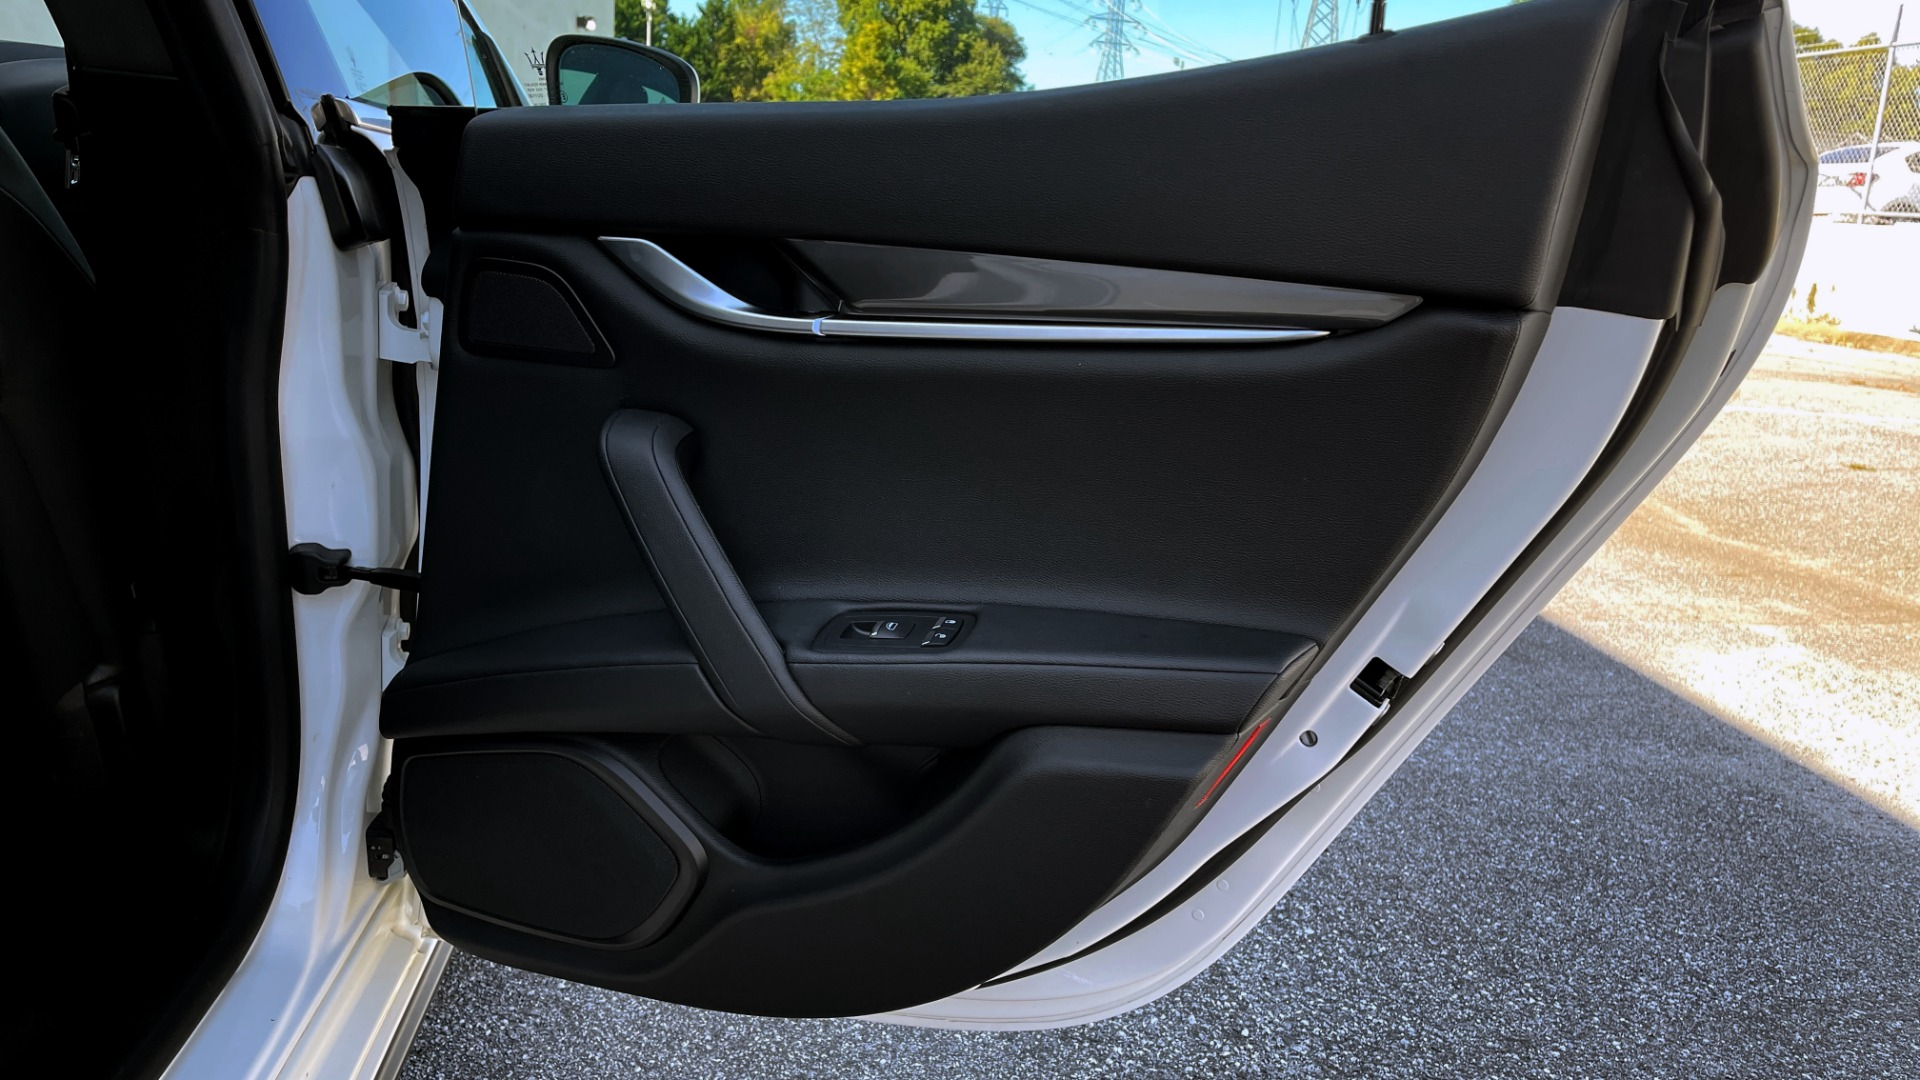 Used 2018 Maserati GHIBLI SEDAN / RWD / 3.0L V6 / SUNROOF / NAV / REARVIEW for sale $42,995 at Formula Imports in Charlotte NC 28227 53